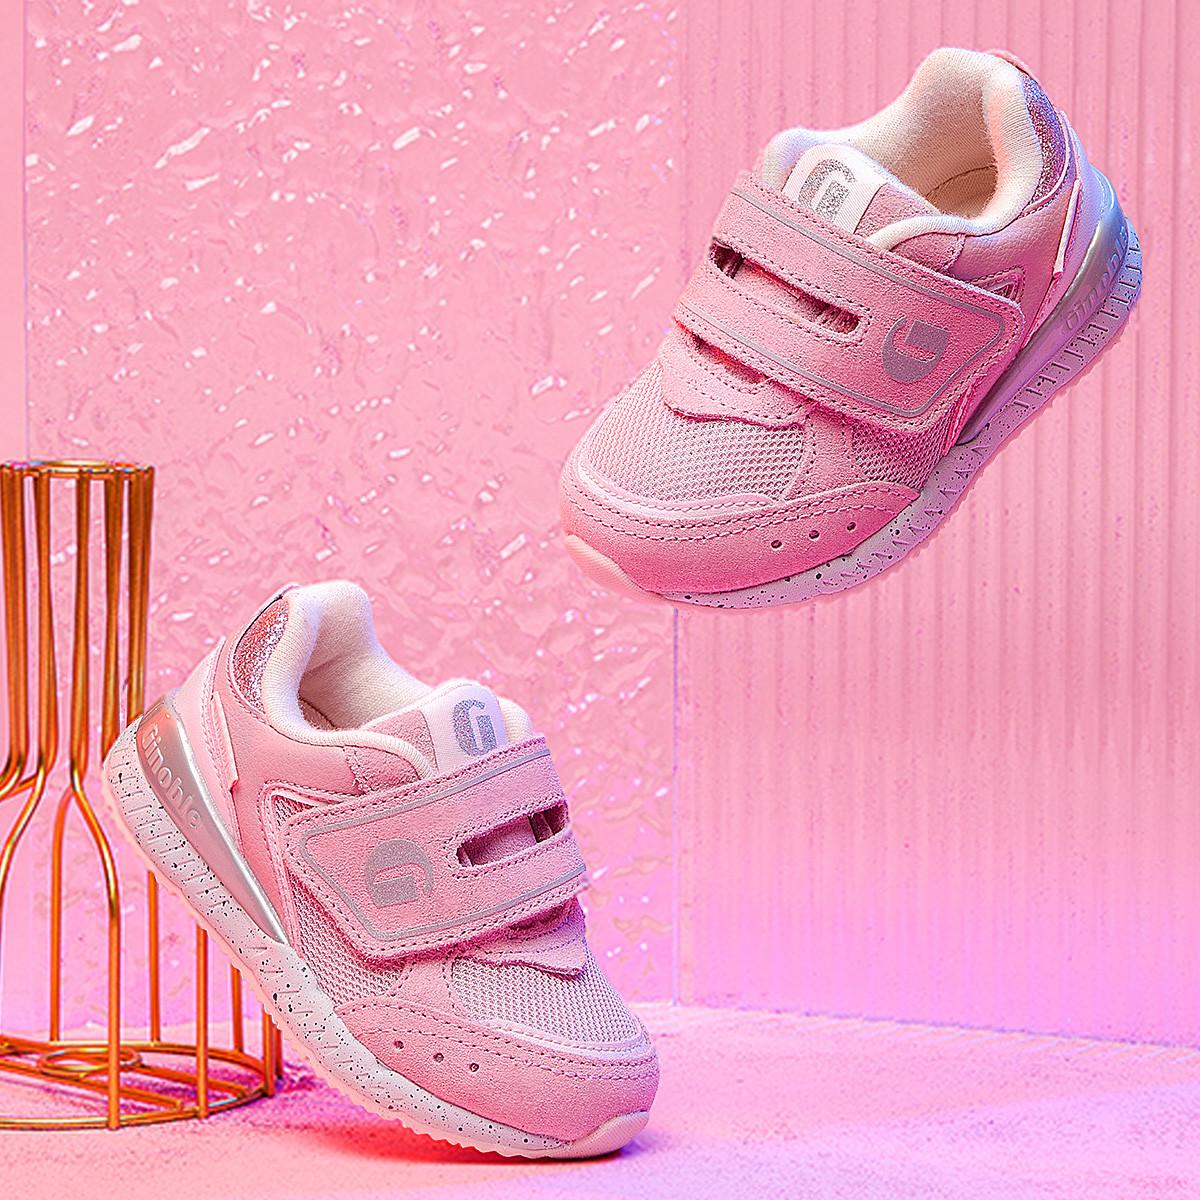 Ginoble 基诺浦 宝宝机能舒适学步鞋